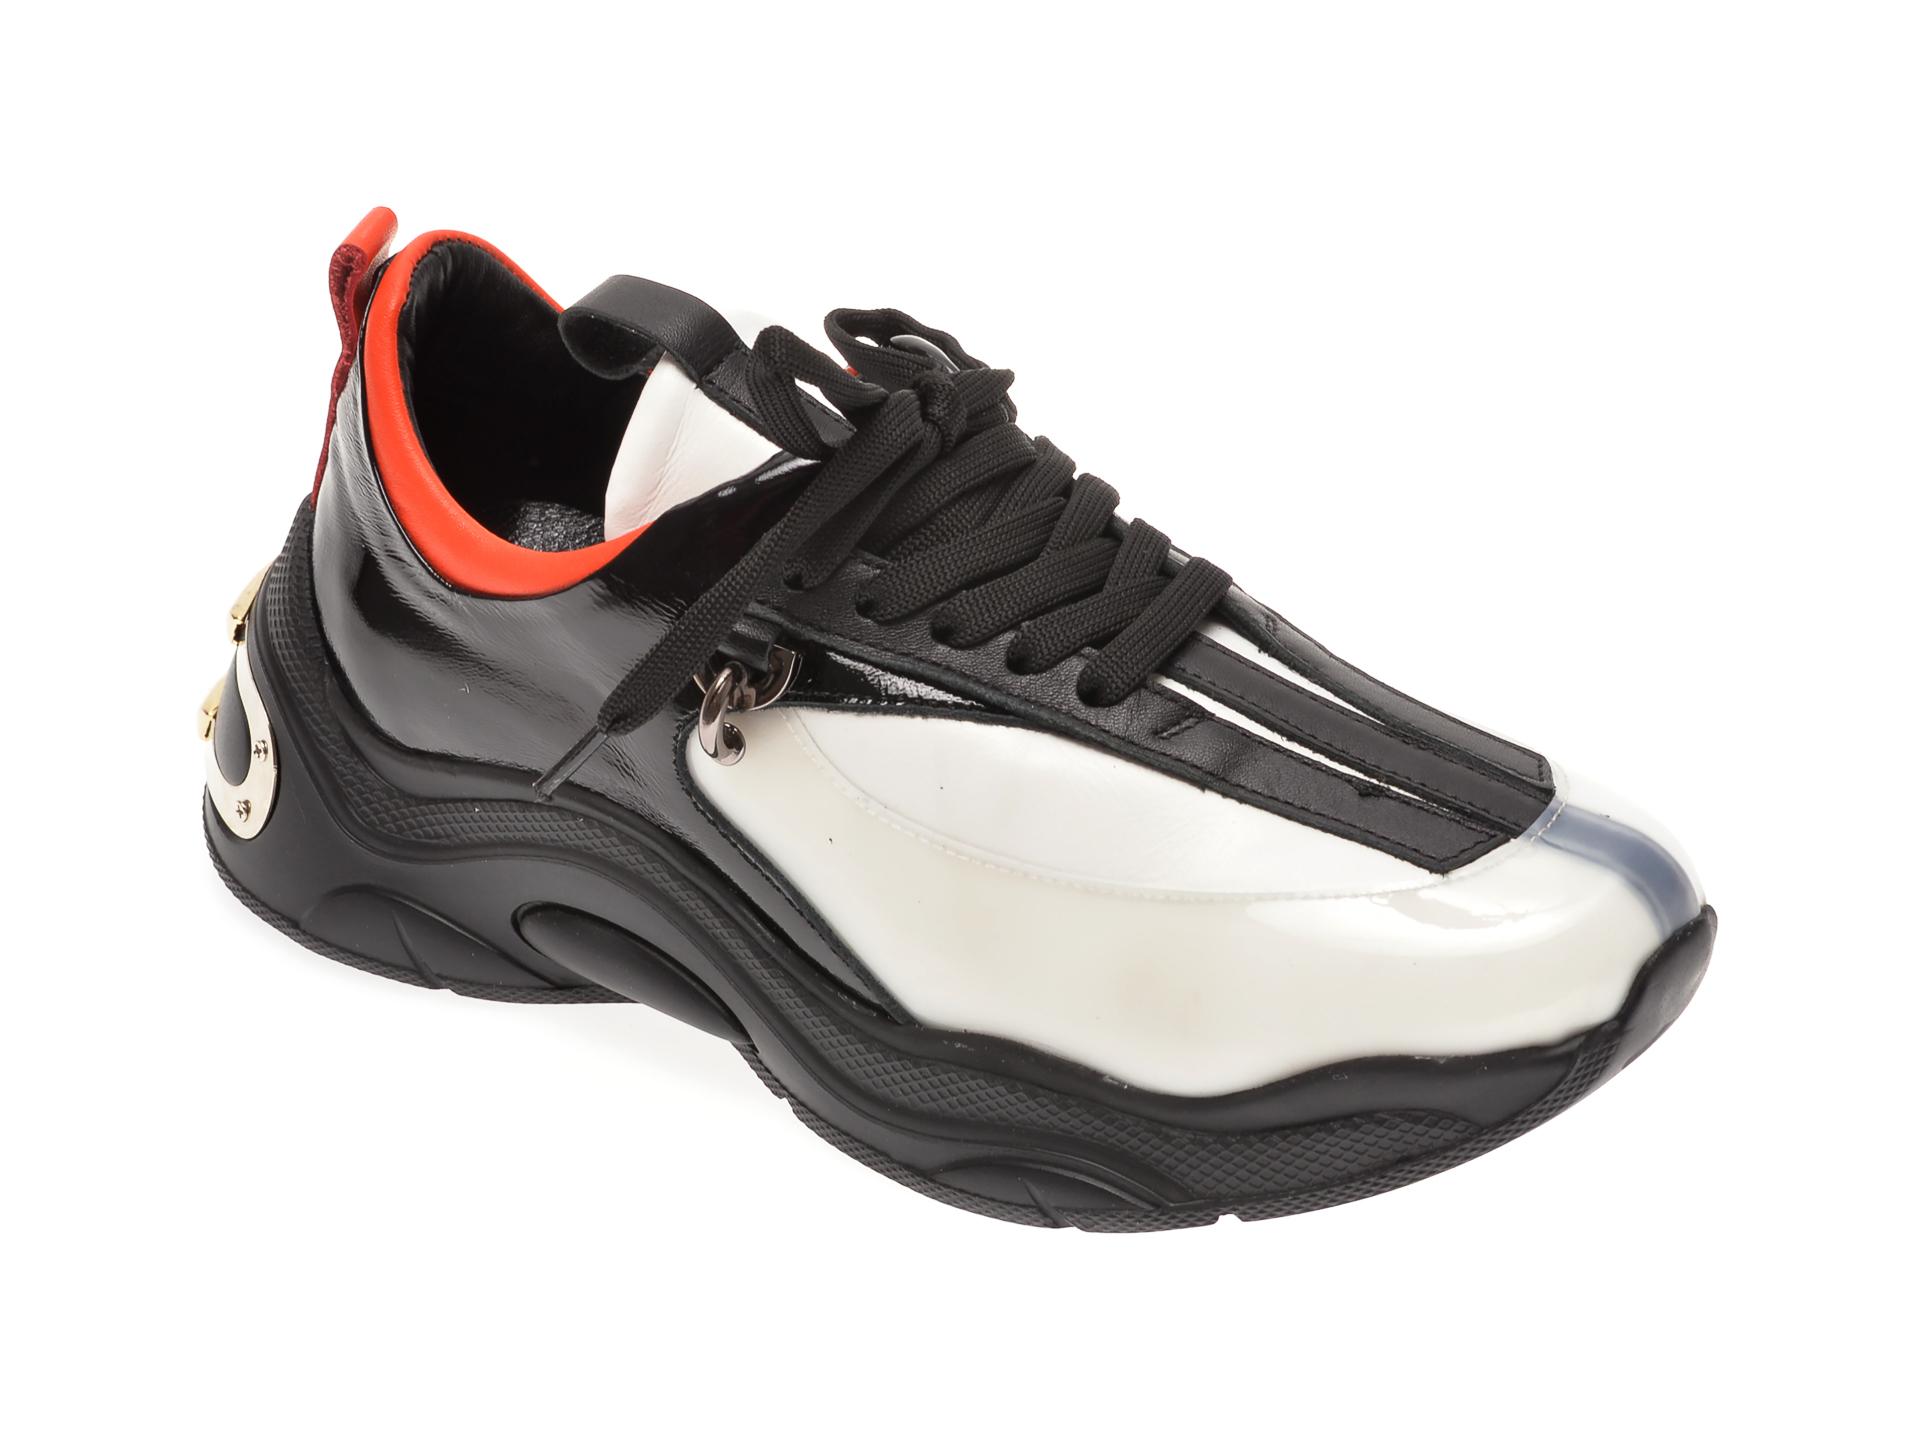 Pantofi sport FLAVIA PASSINI alb negri, 135P45, din piele naturala